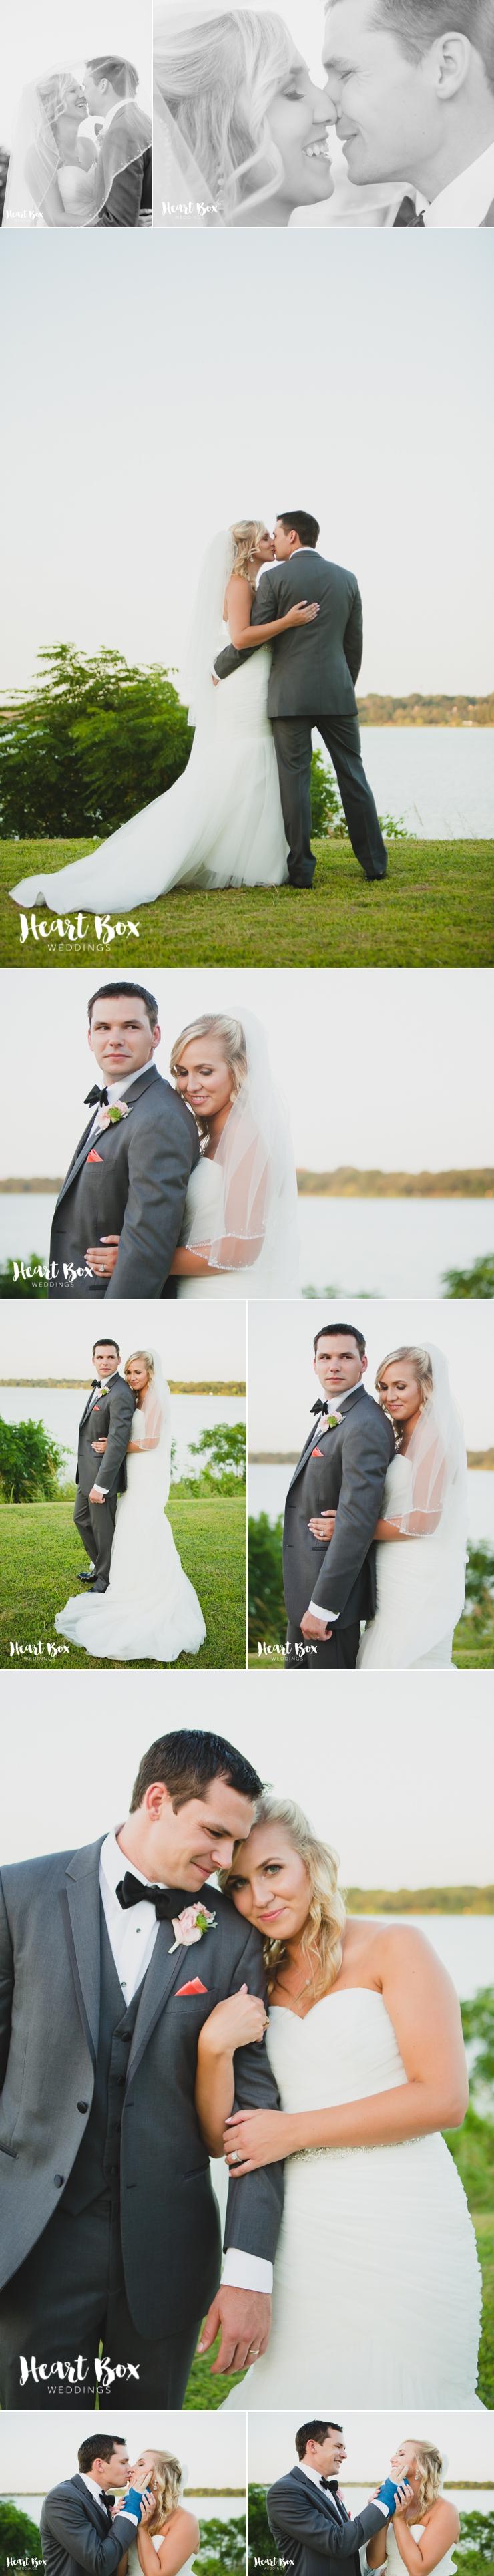 Gould Wedding Blog Collages 17.jpg